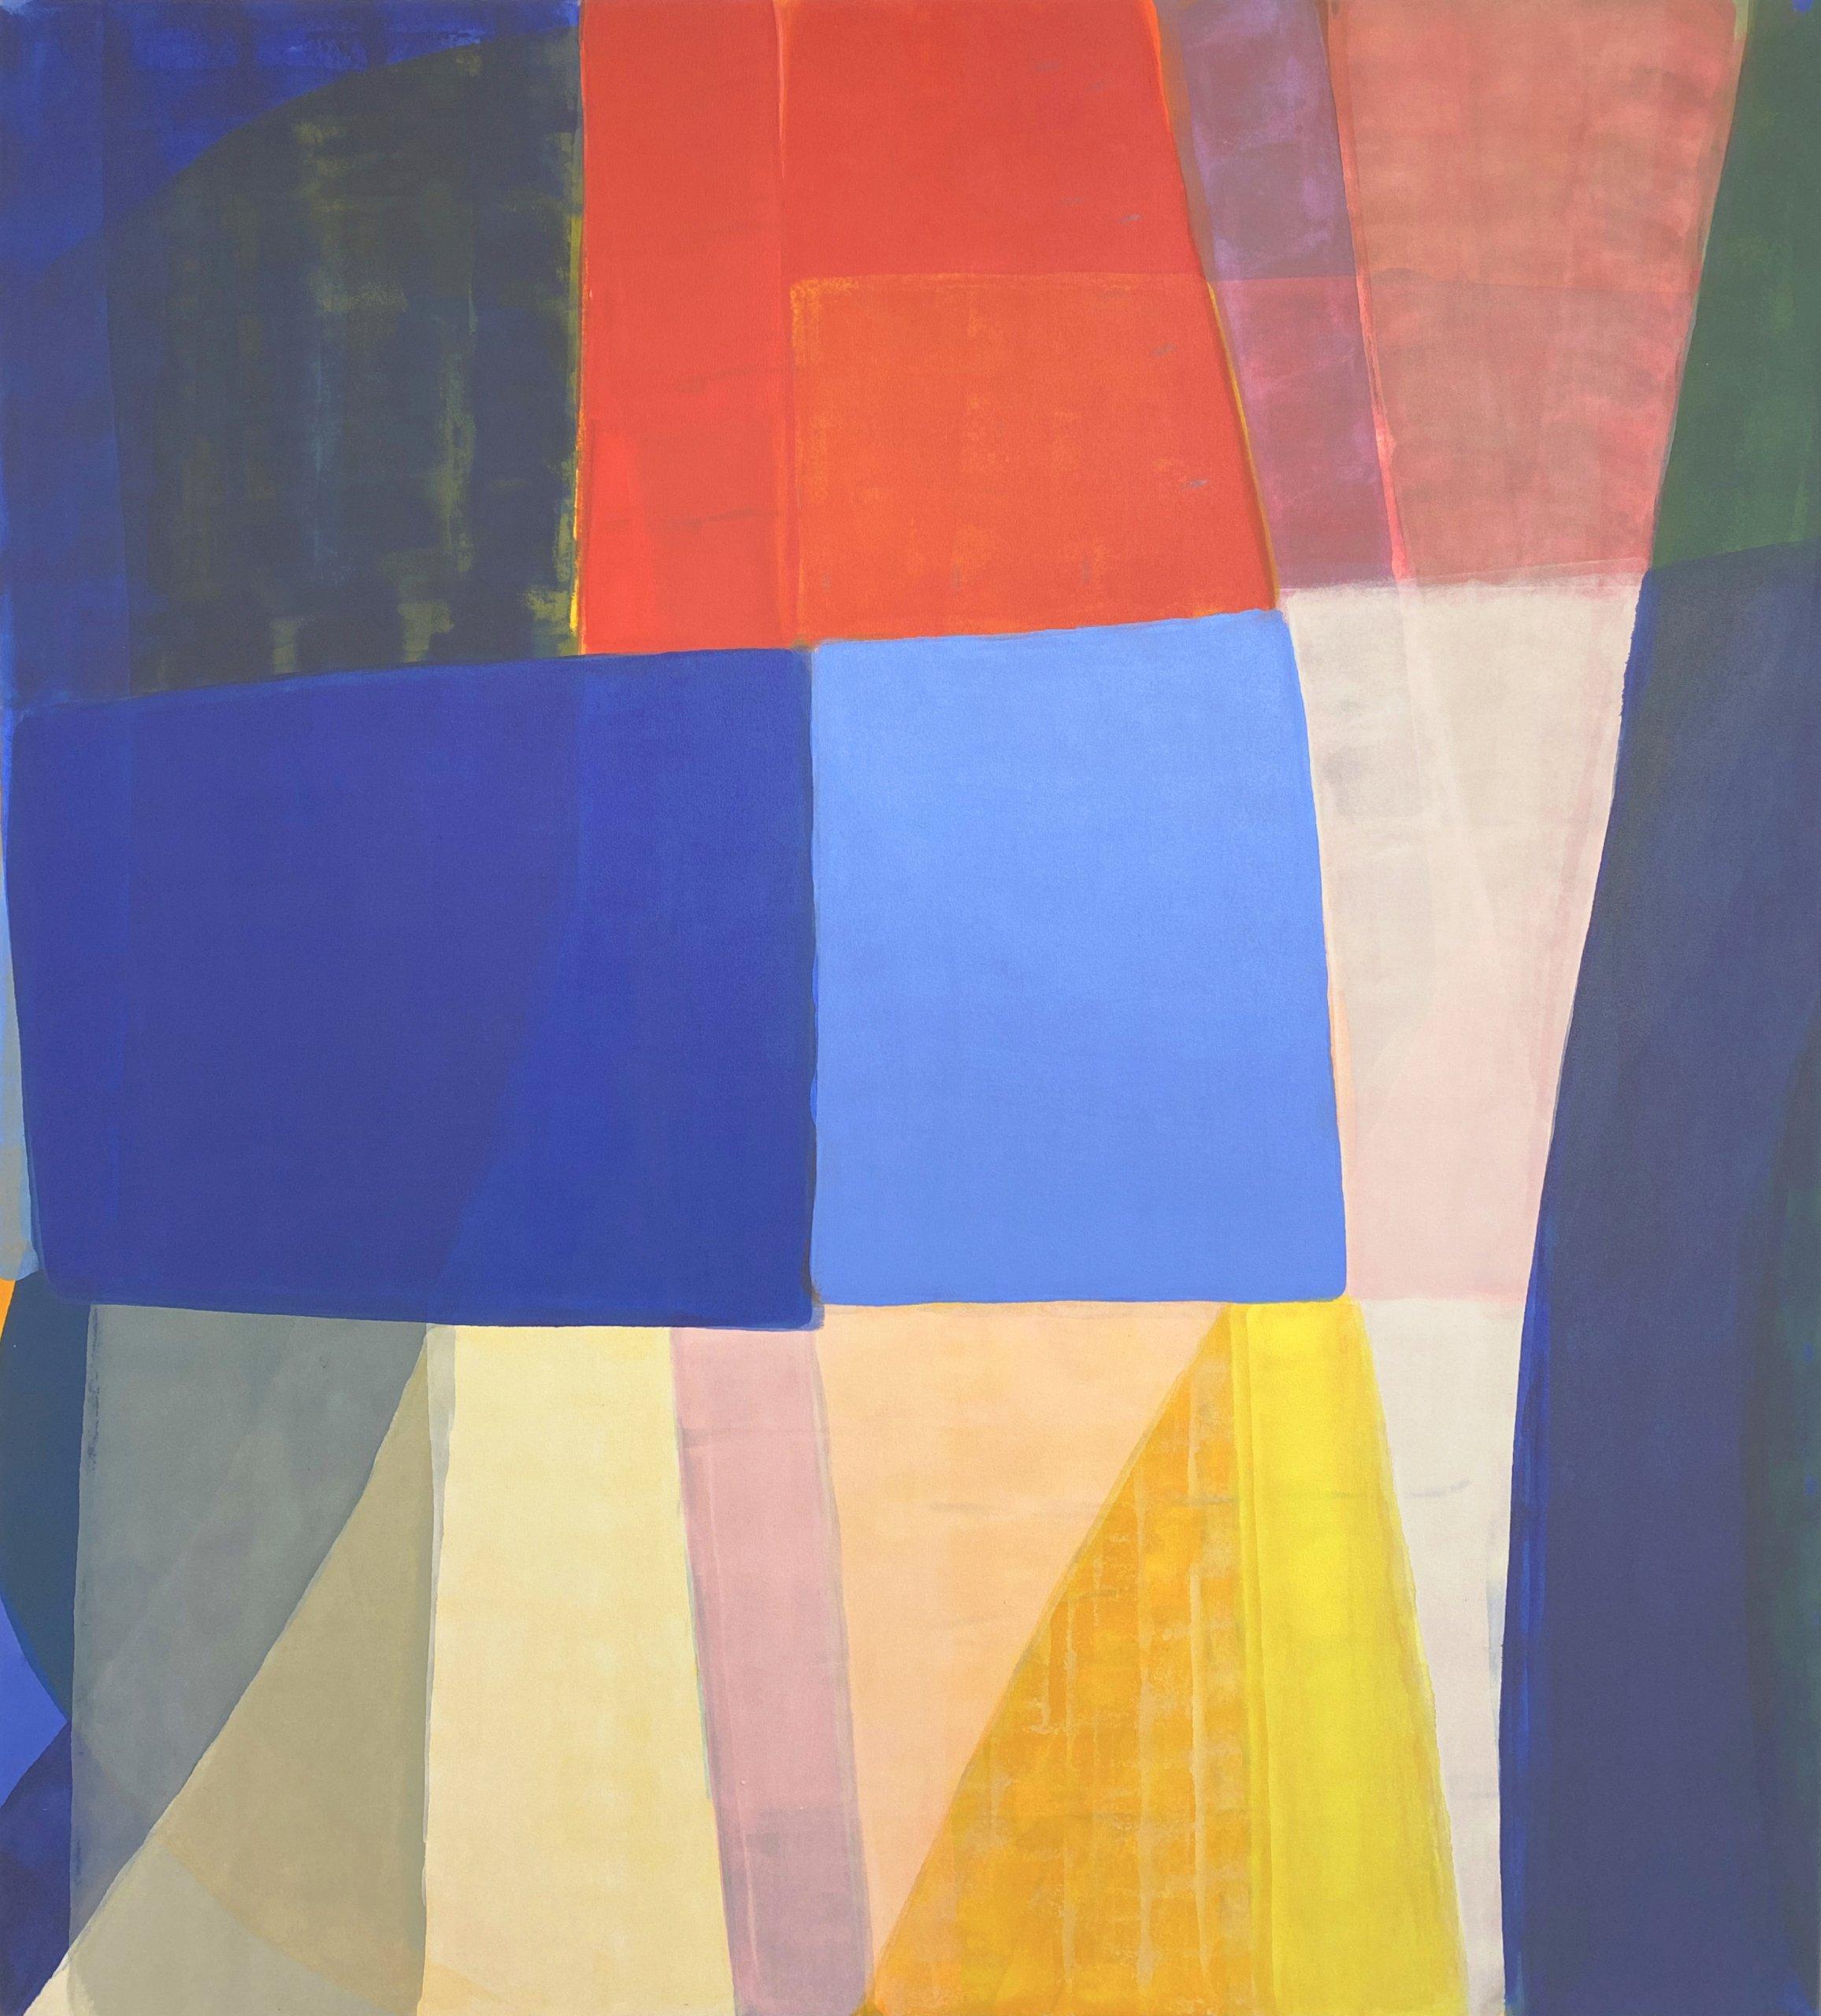 Anna Kunz Saved Hour, 2021 acrylic on canvas 66 x 60 in. (167.6 x 152.4 cm.)